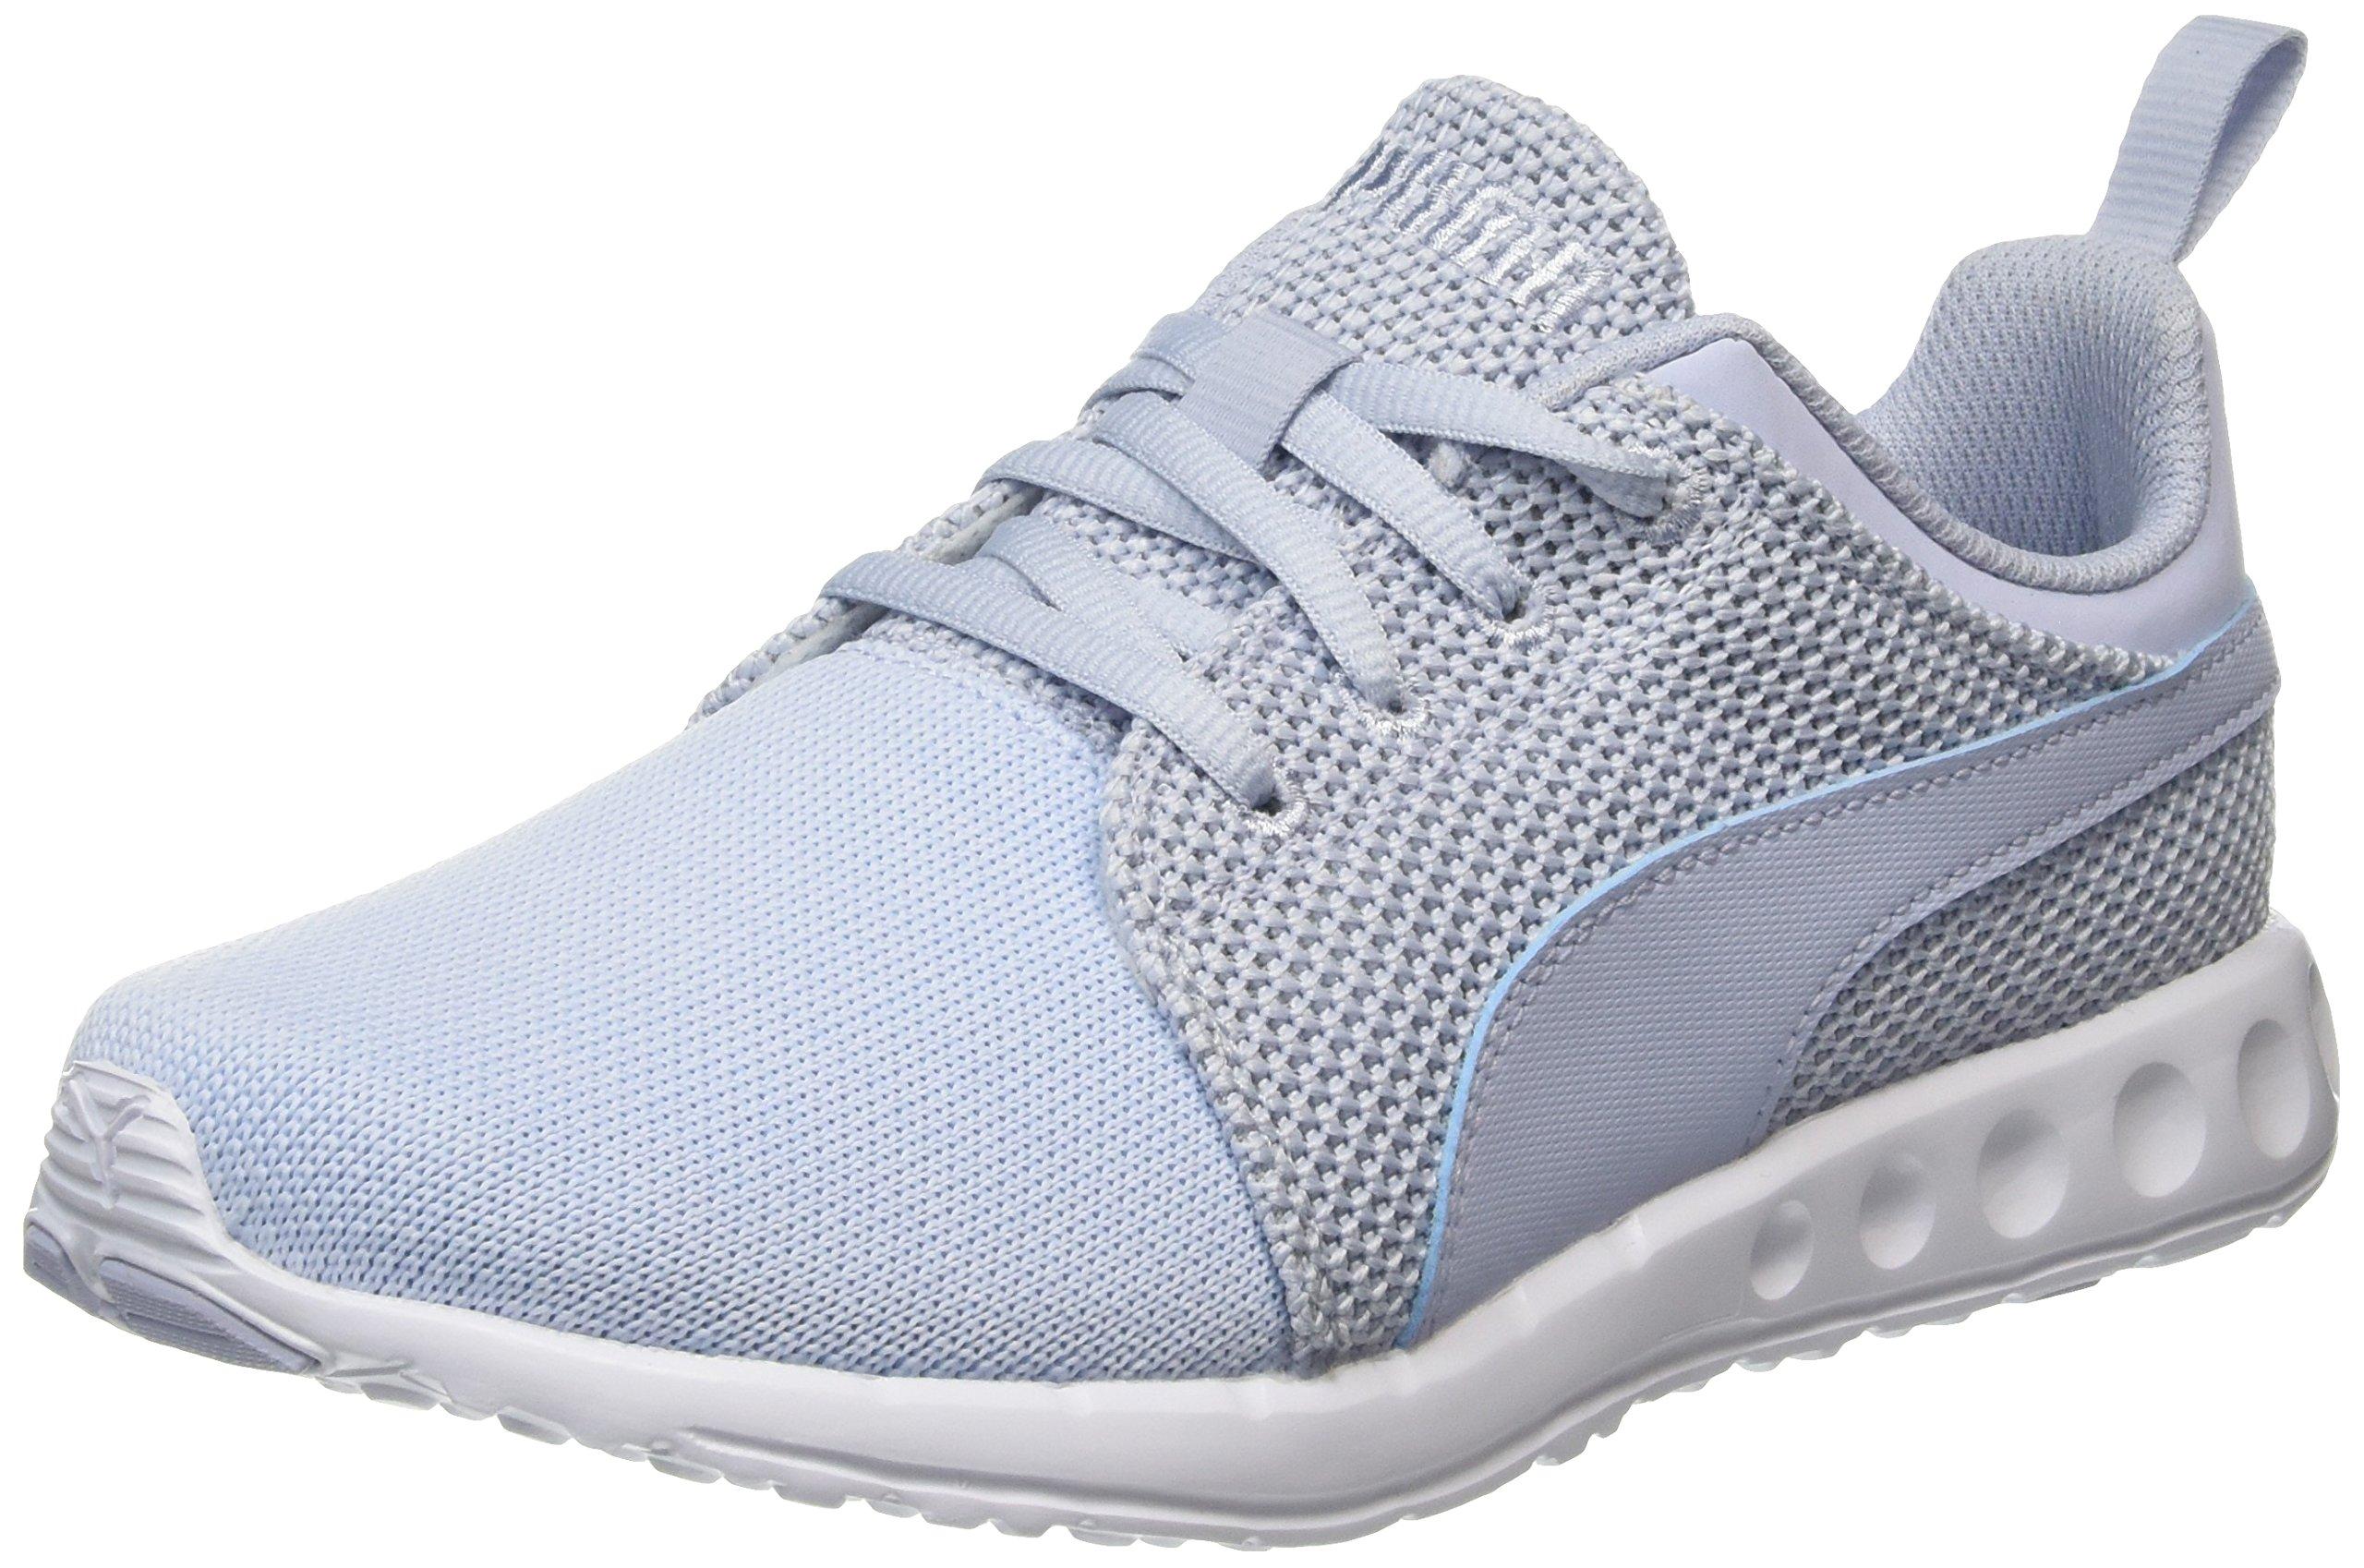 AdulteBleuhalogen Puma Mixte Carson Knit De Runner White Running Compétition Blue EeaChaussures 0738 lavendar Lustre Eu EDHIW29Y